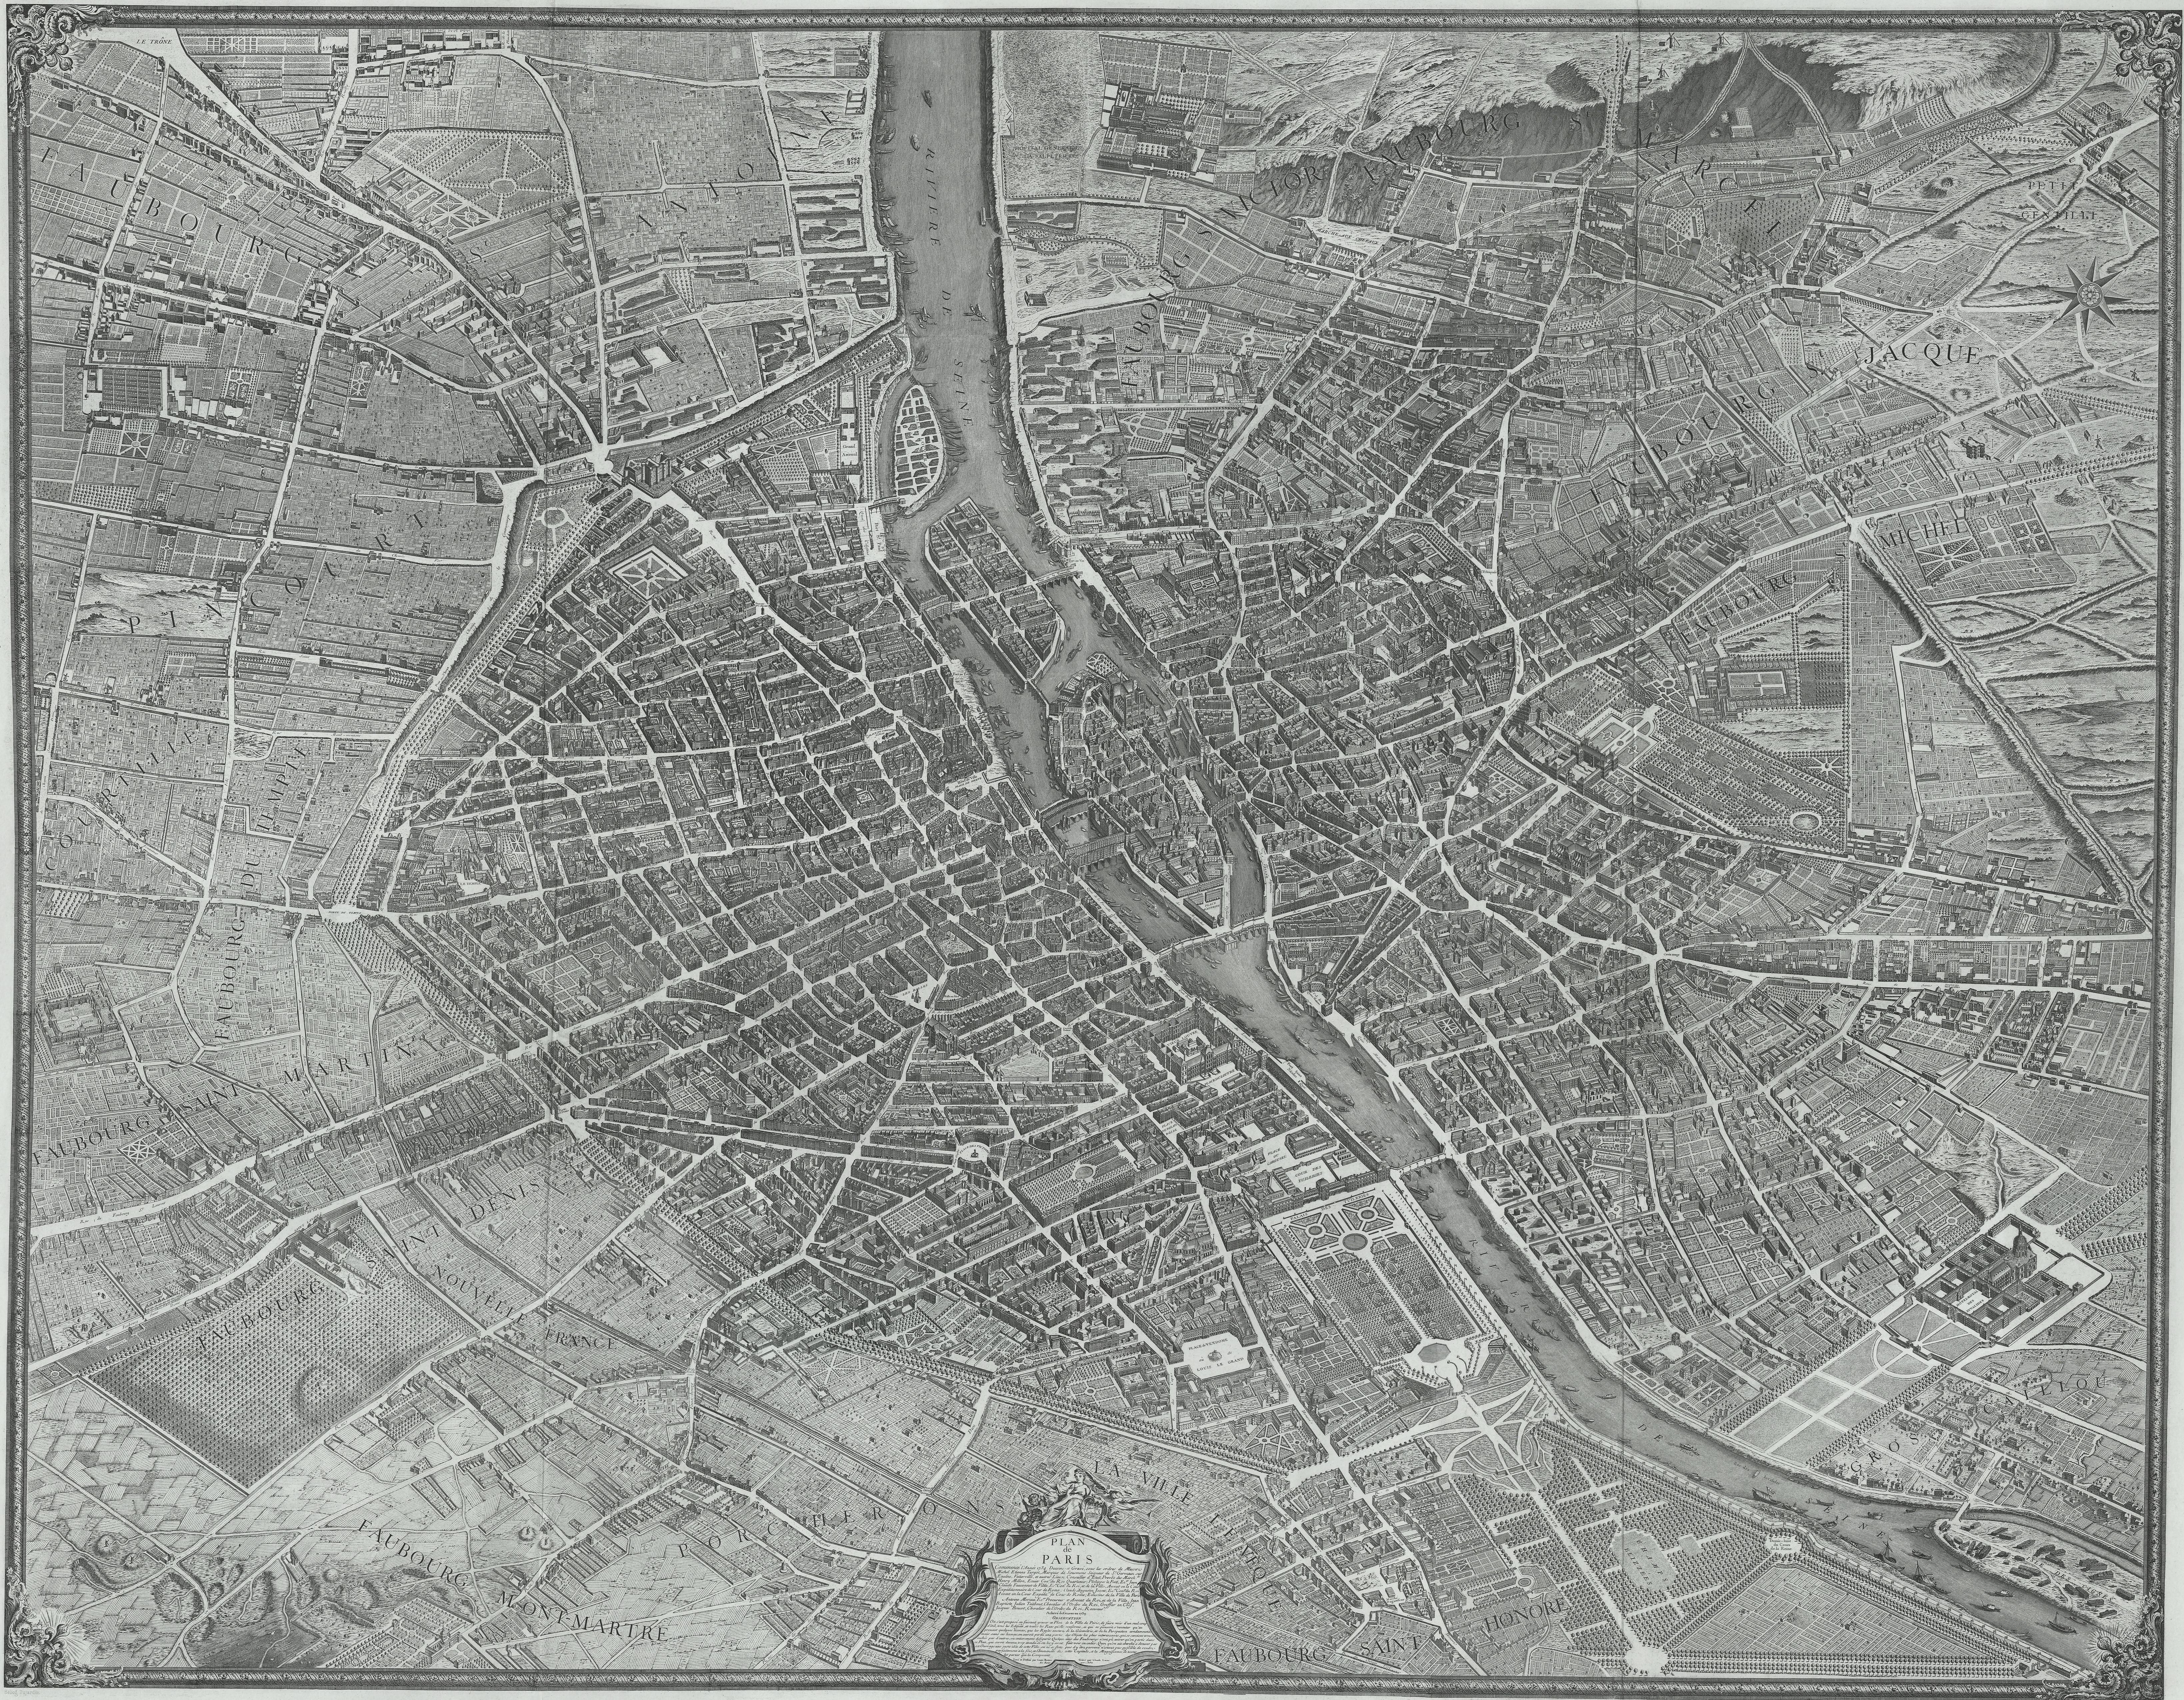 FilePlan De Turgotjpg Wikimedia Commons - Large map of paris france